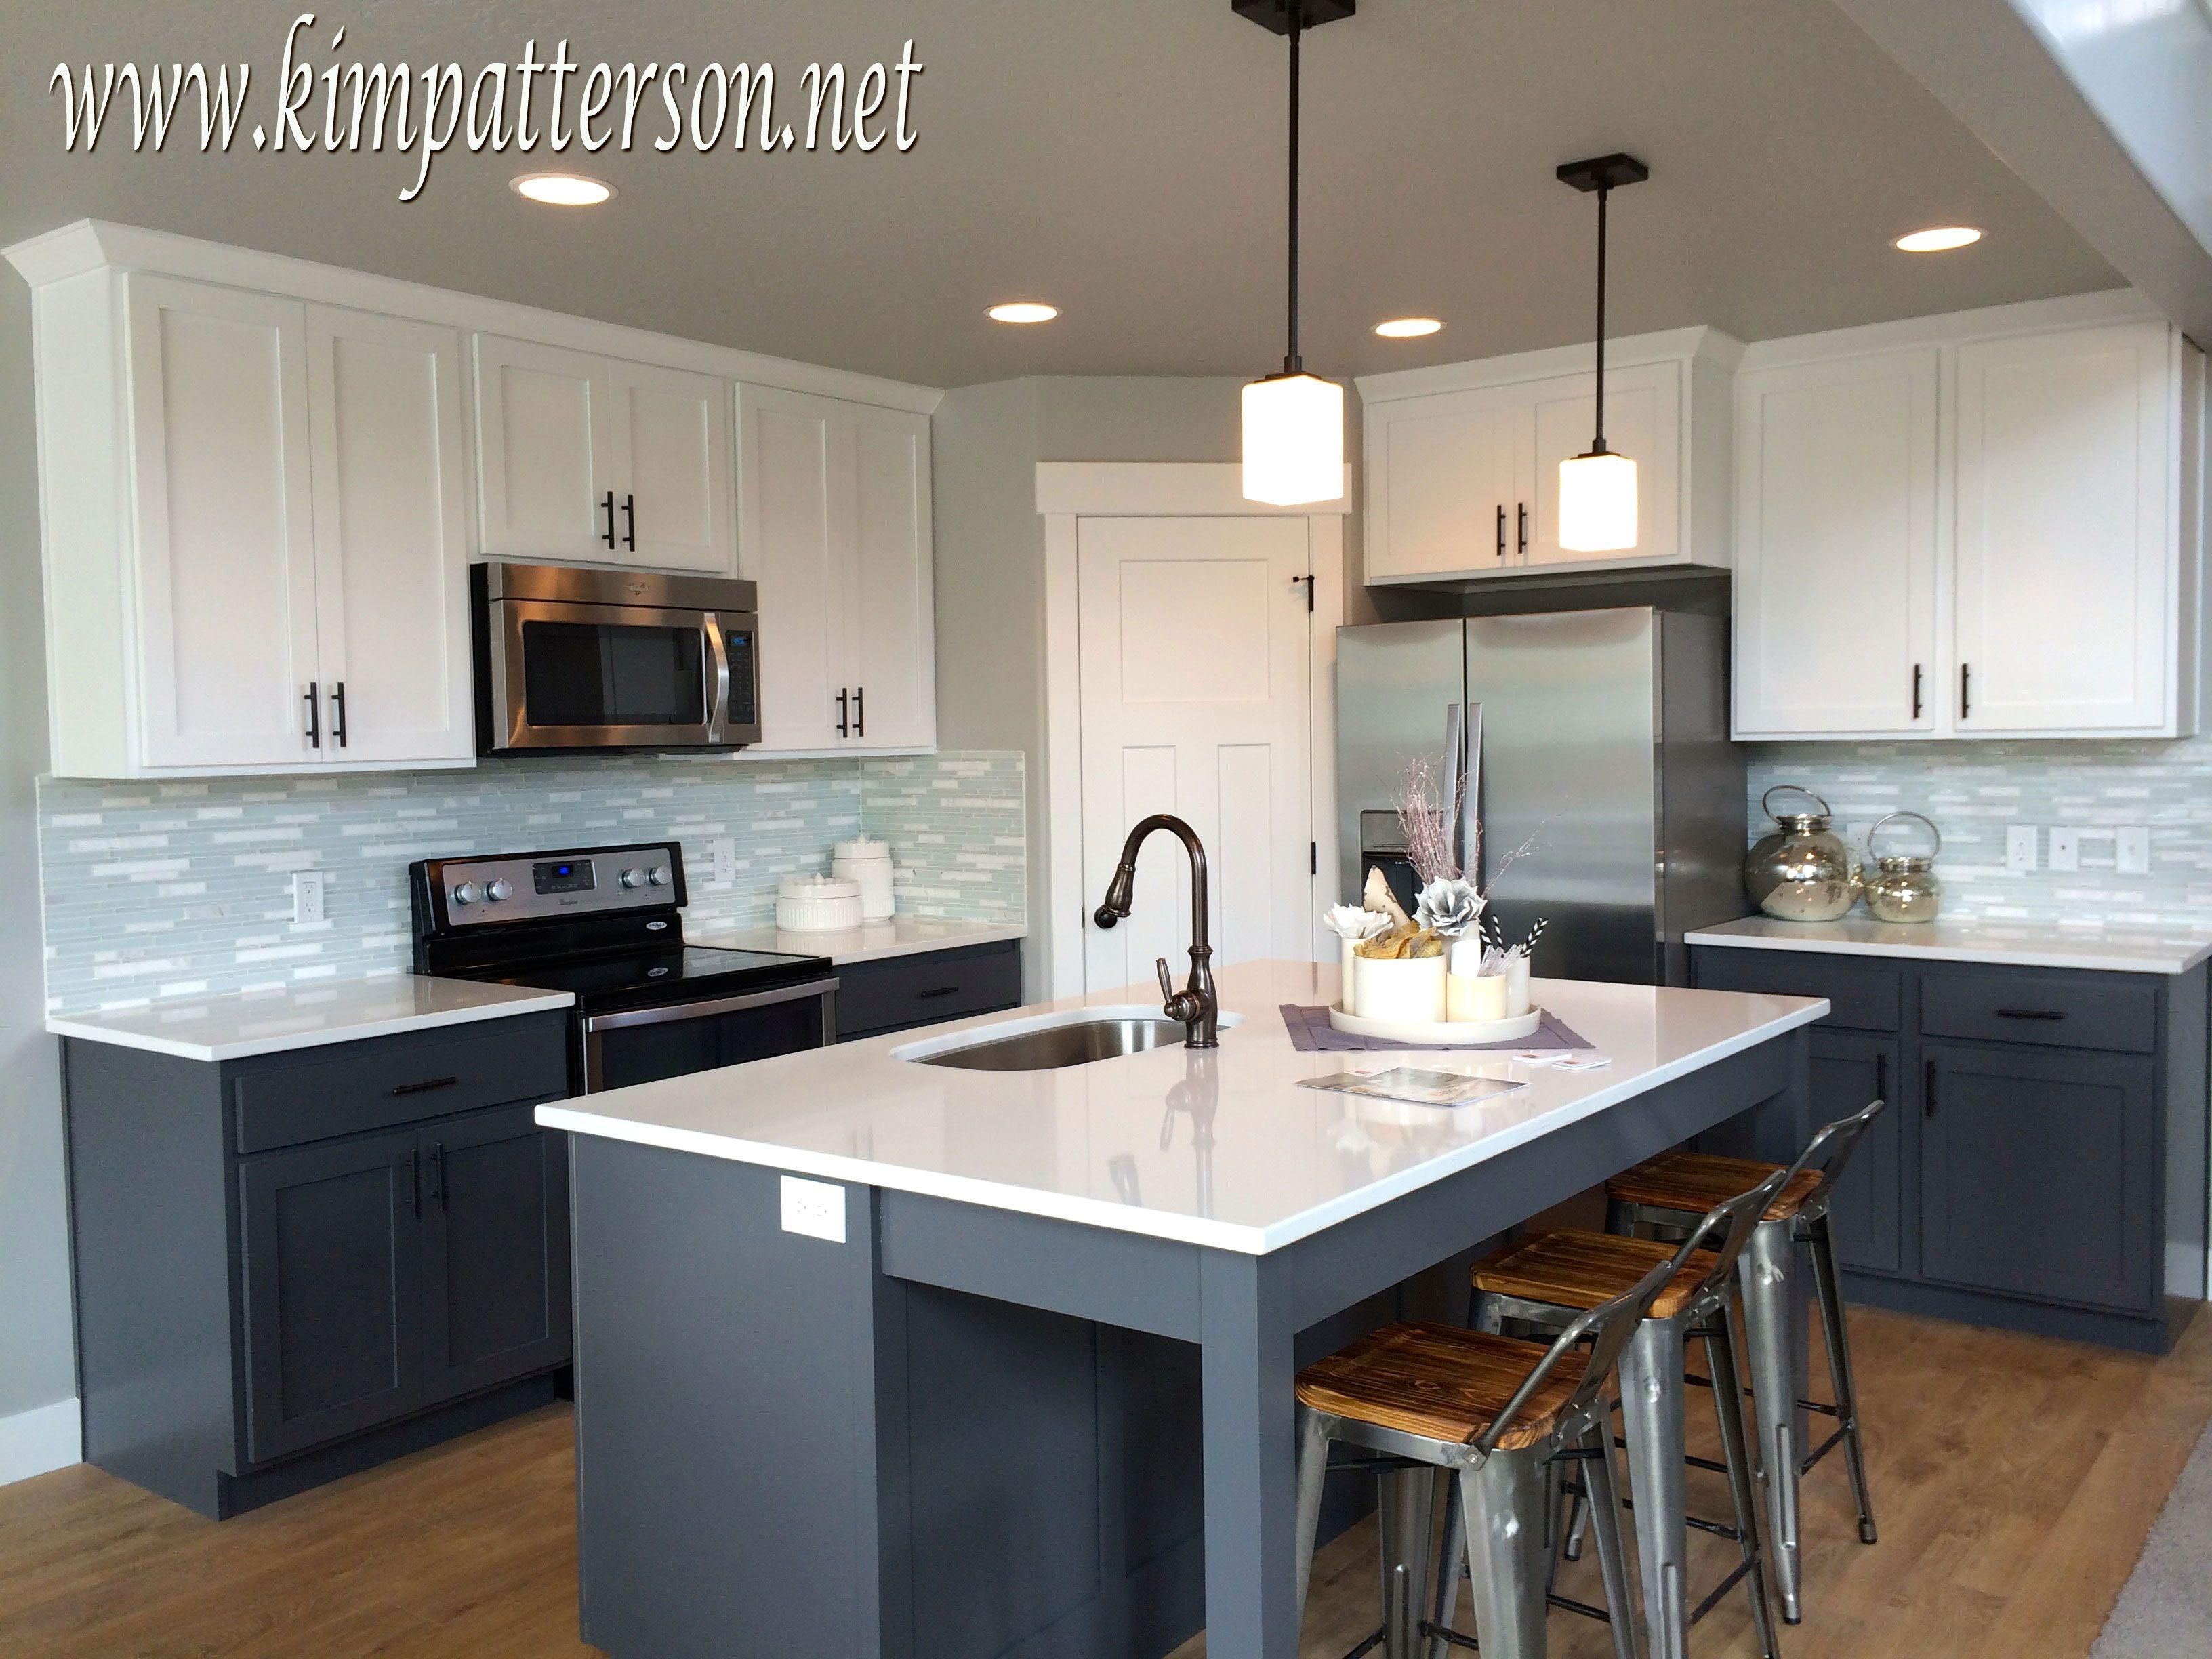 Kitchen Antique White Cabinets With Black Appliances Grey